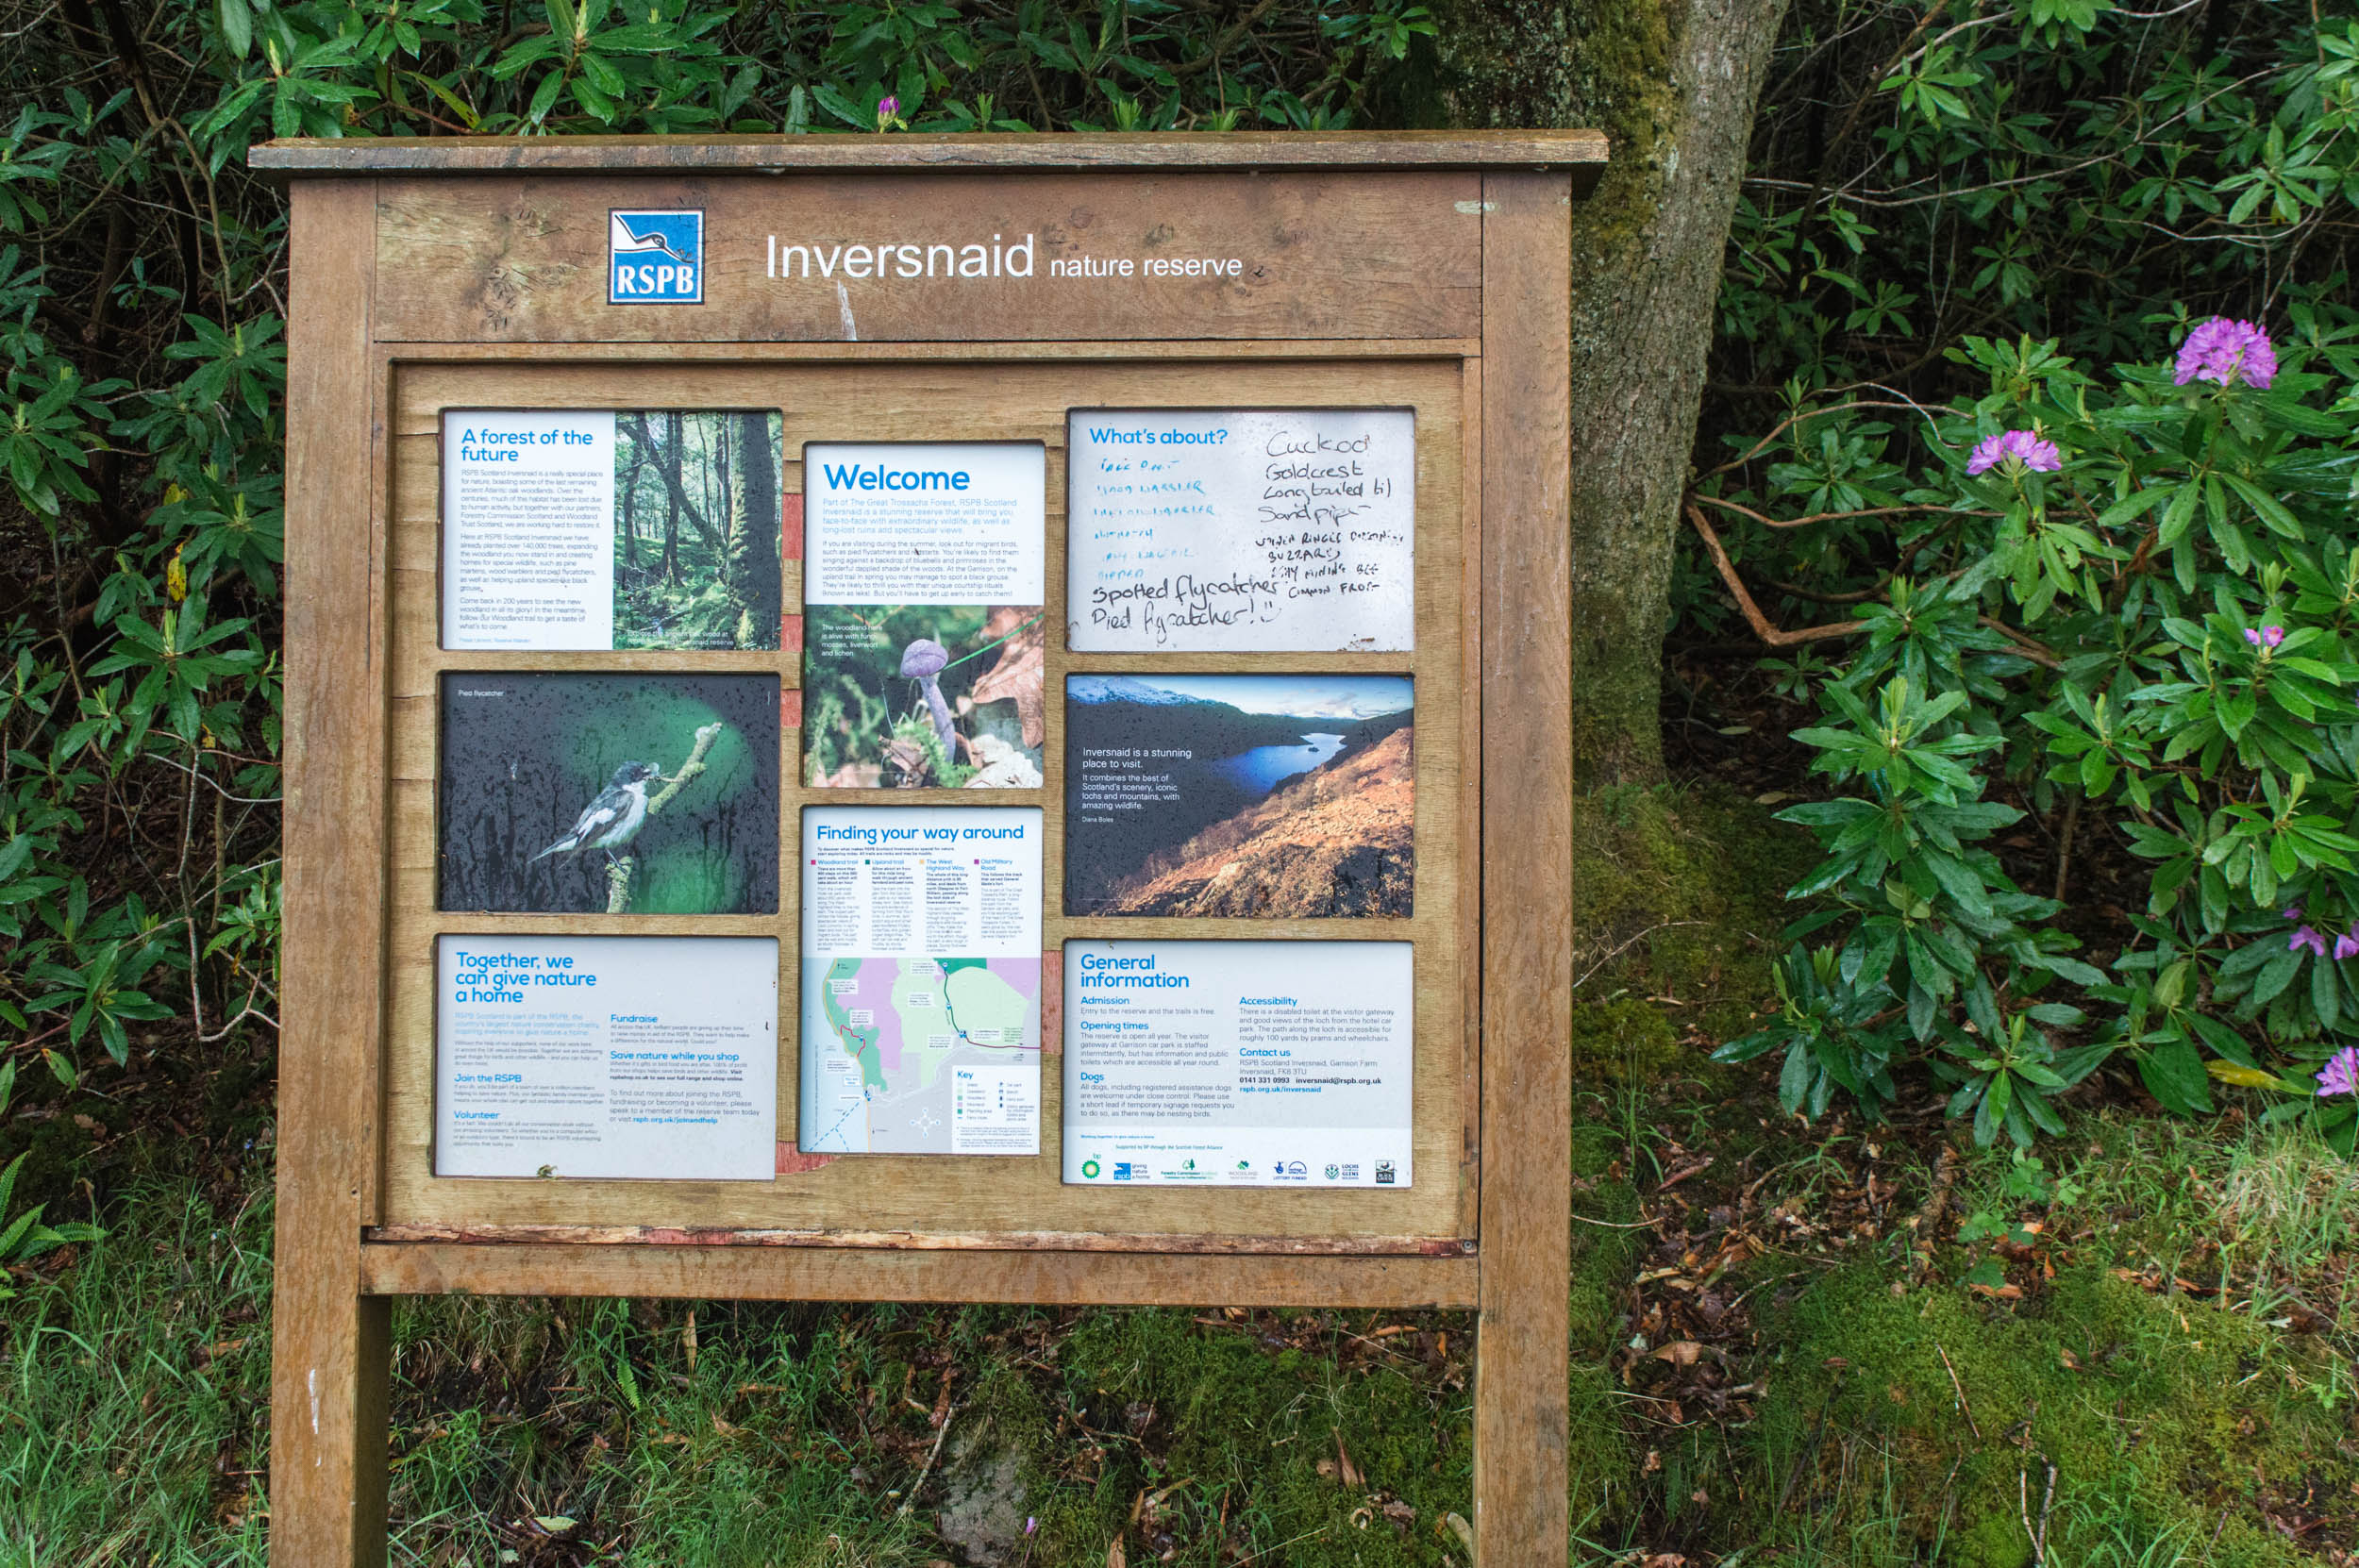 Inversnaid RSPB Reserve